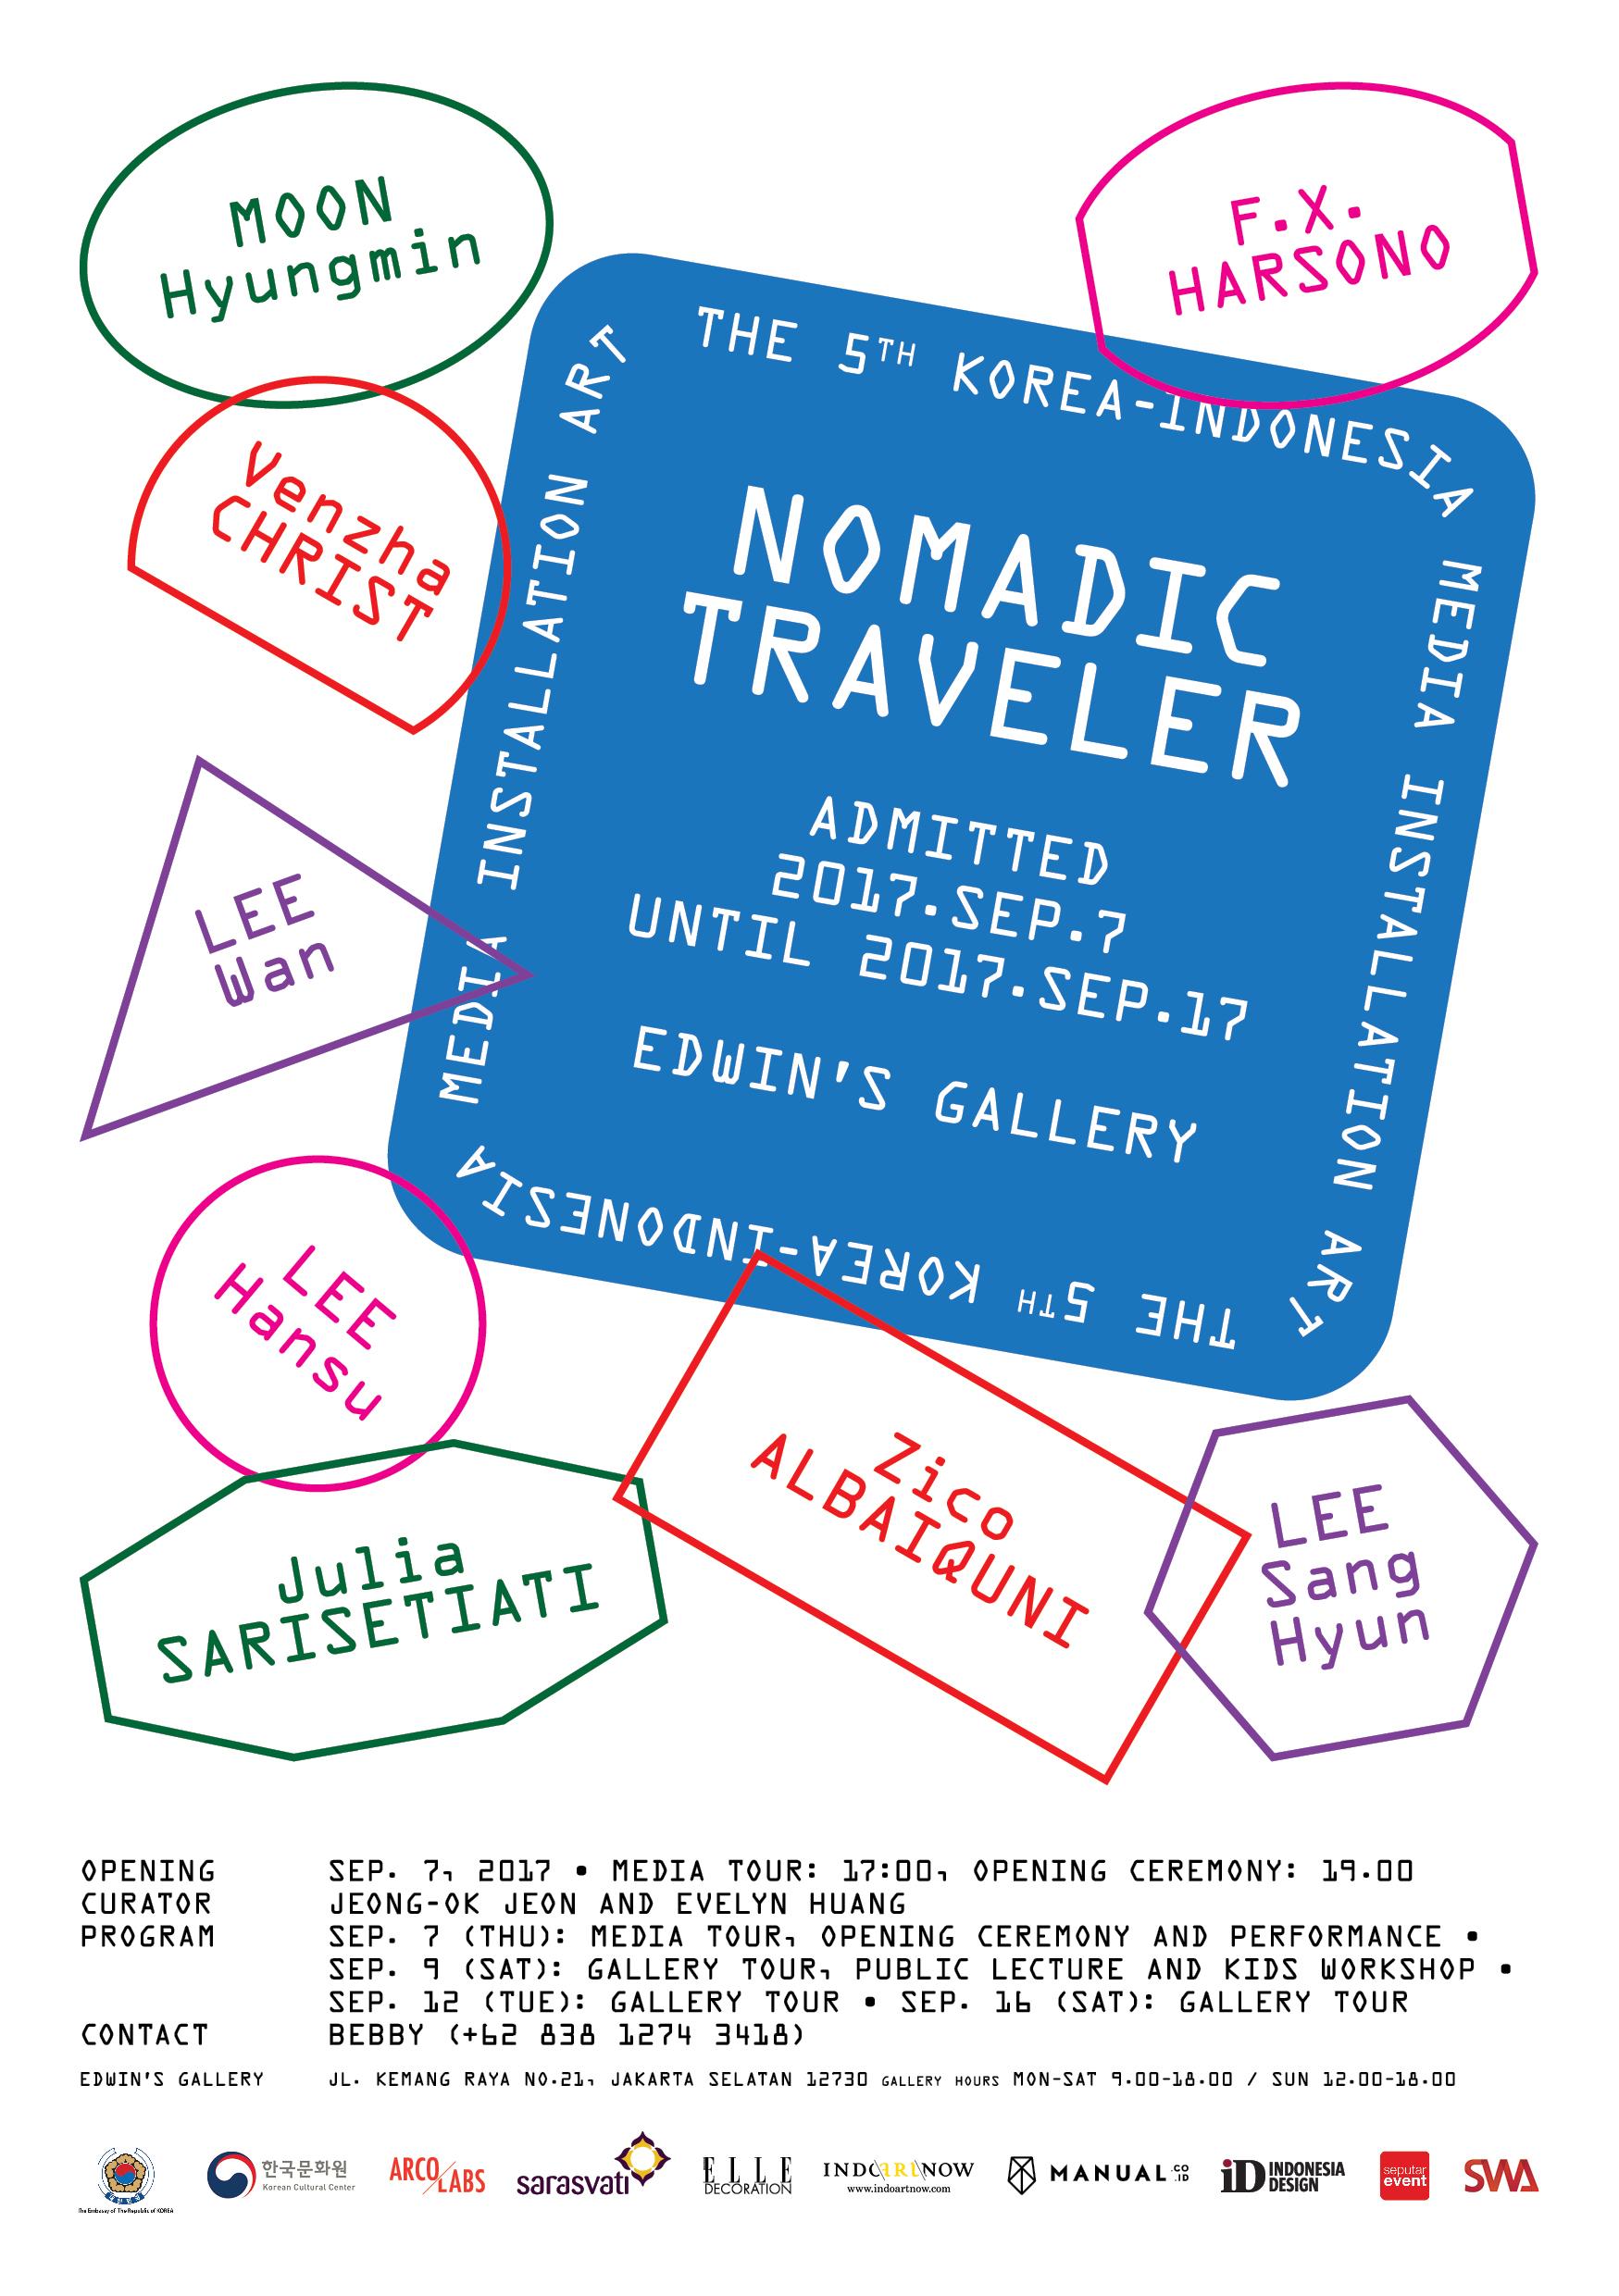 NOMADIC TRAVELER, the 5th Korea-Indonesia Media Installation Art Exhibition at Edwin's Gallery 7 – 17 September 2017.